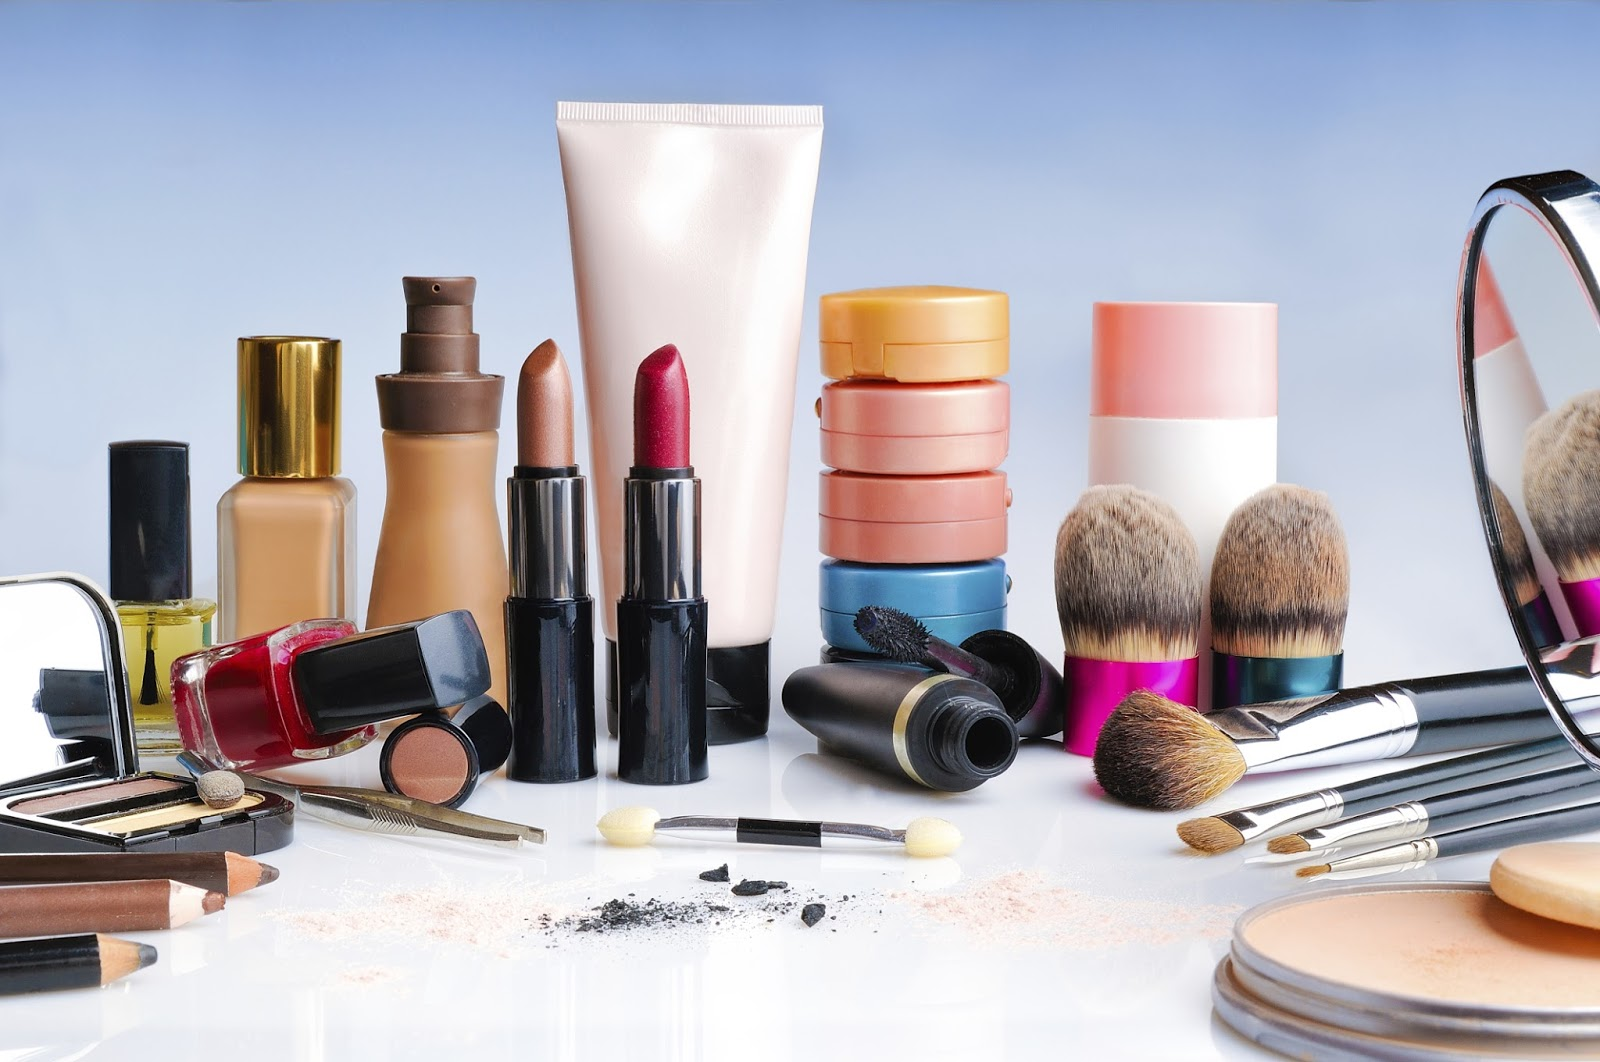 Rejuvenate Your Skin With Asap Daily Exfoliating Facial Scrub